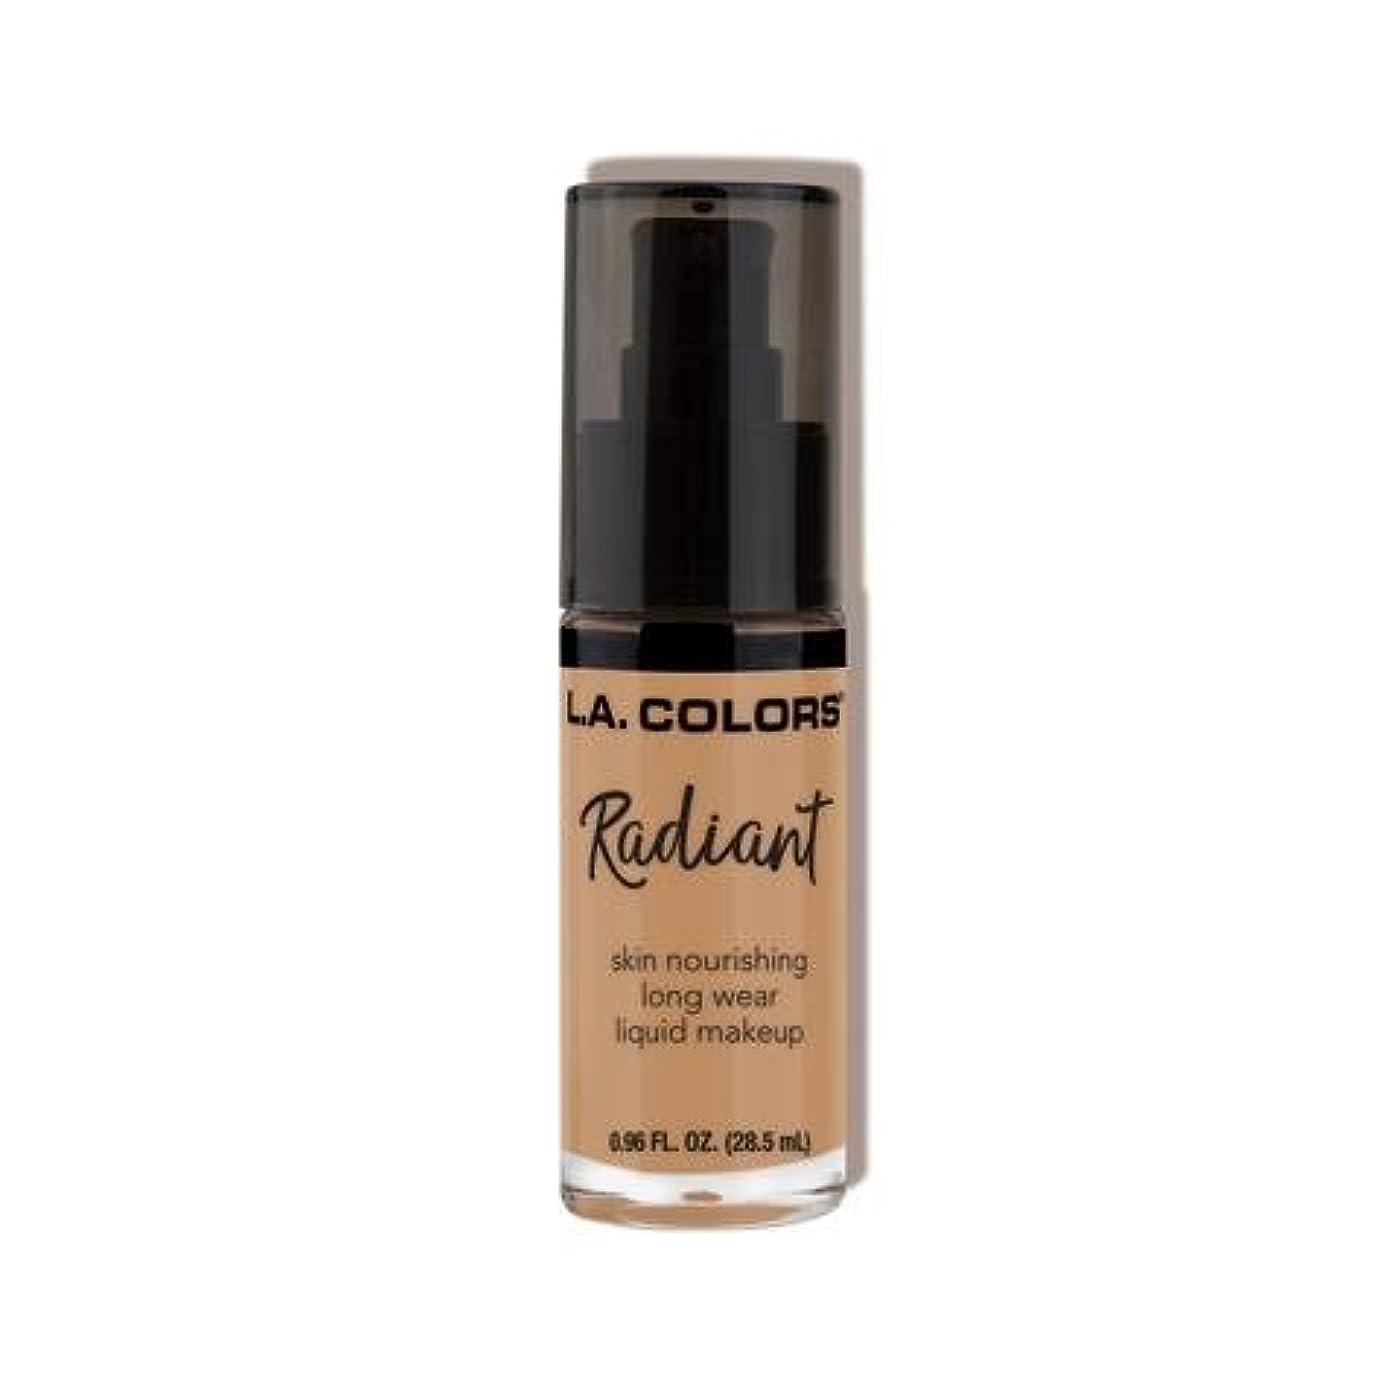 進捗虐待倫理的(3 Pack) L.A. COLORS Radiant Liquid Makeup - Light Toffee (並行輸入品)